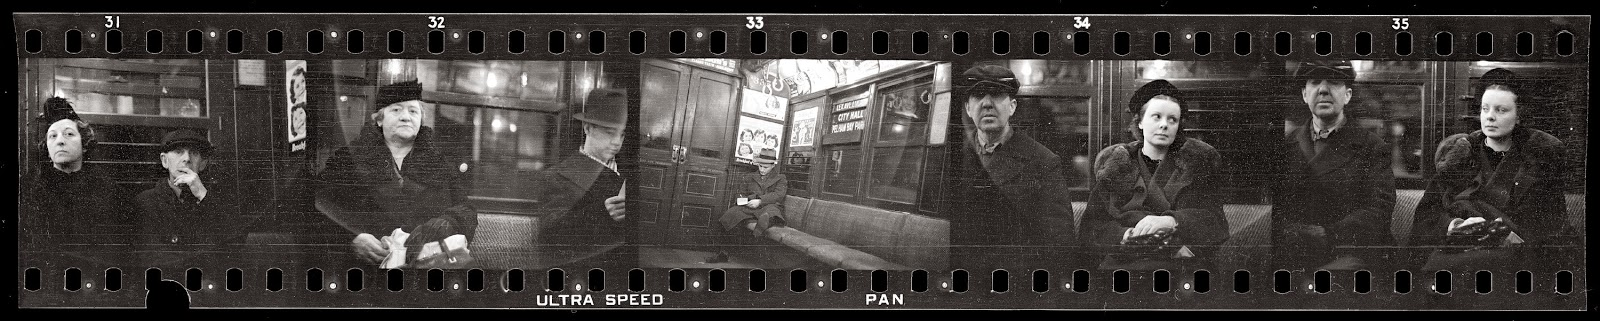 Subway Passengers, New York City from between 1938-1941 by Walker Evans.jpg